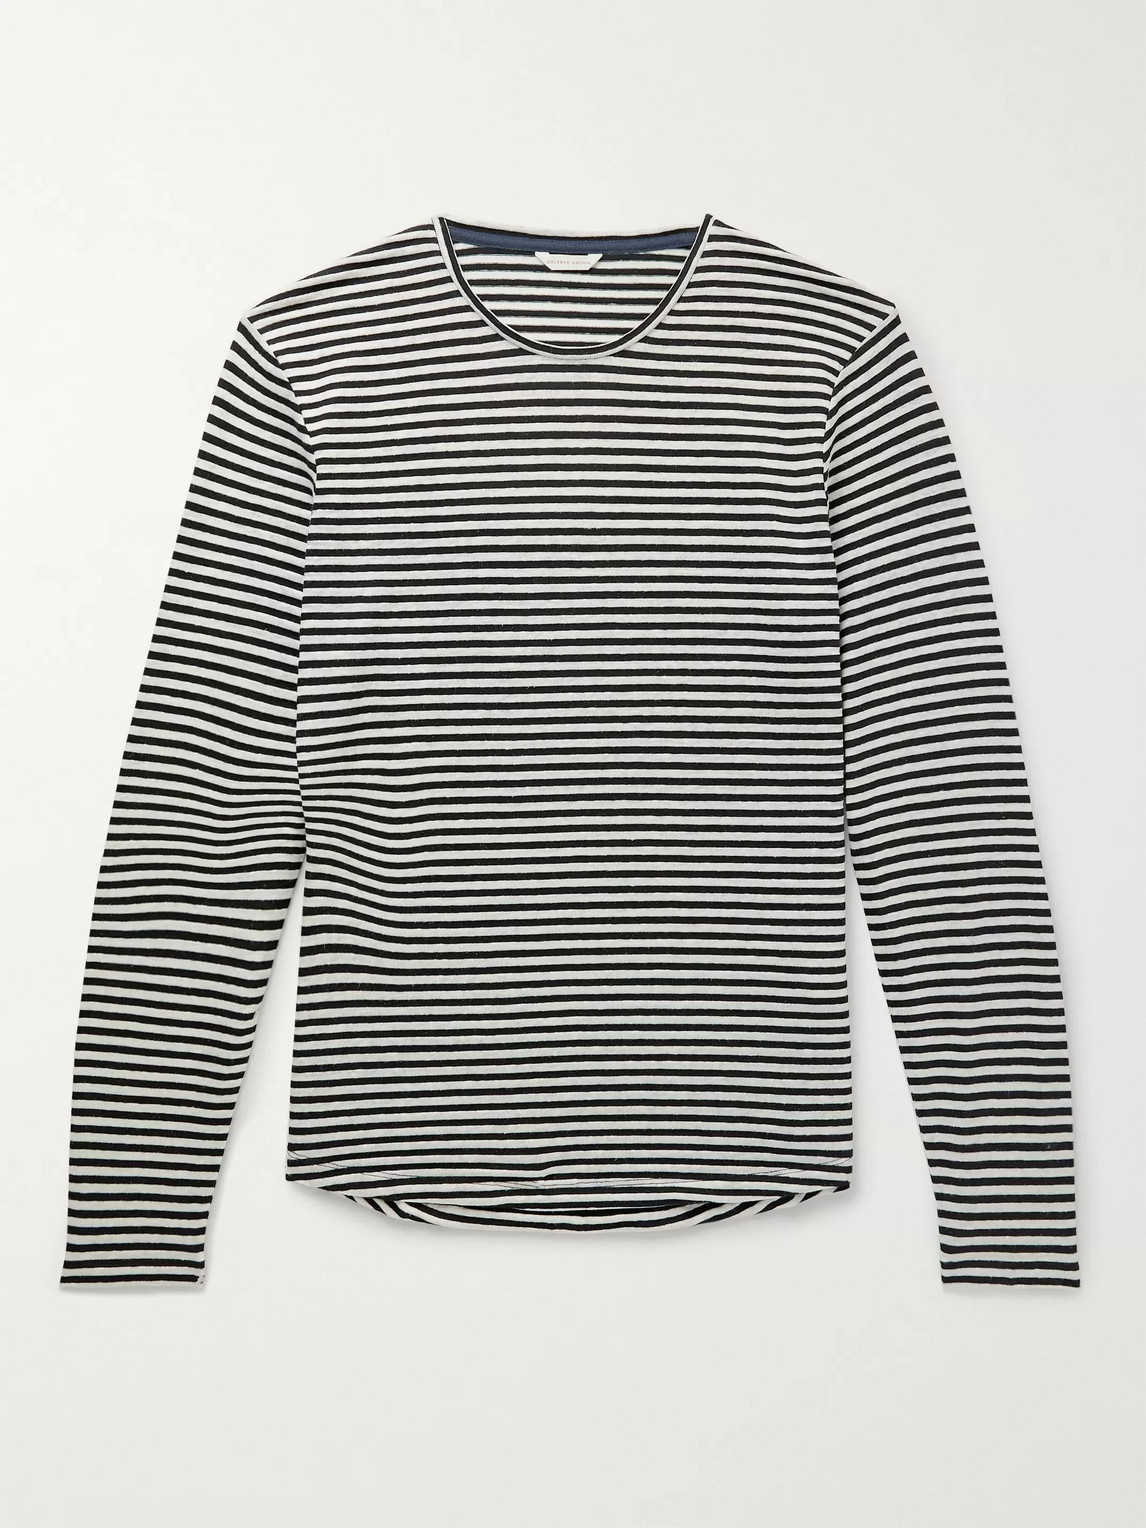 Orlebar Brown – Ob-t Striped Cotton And Linen-blend T-shirt – Blue